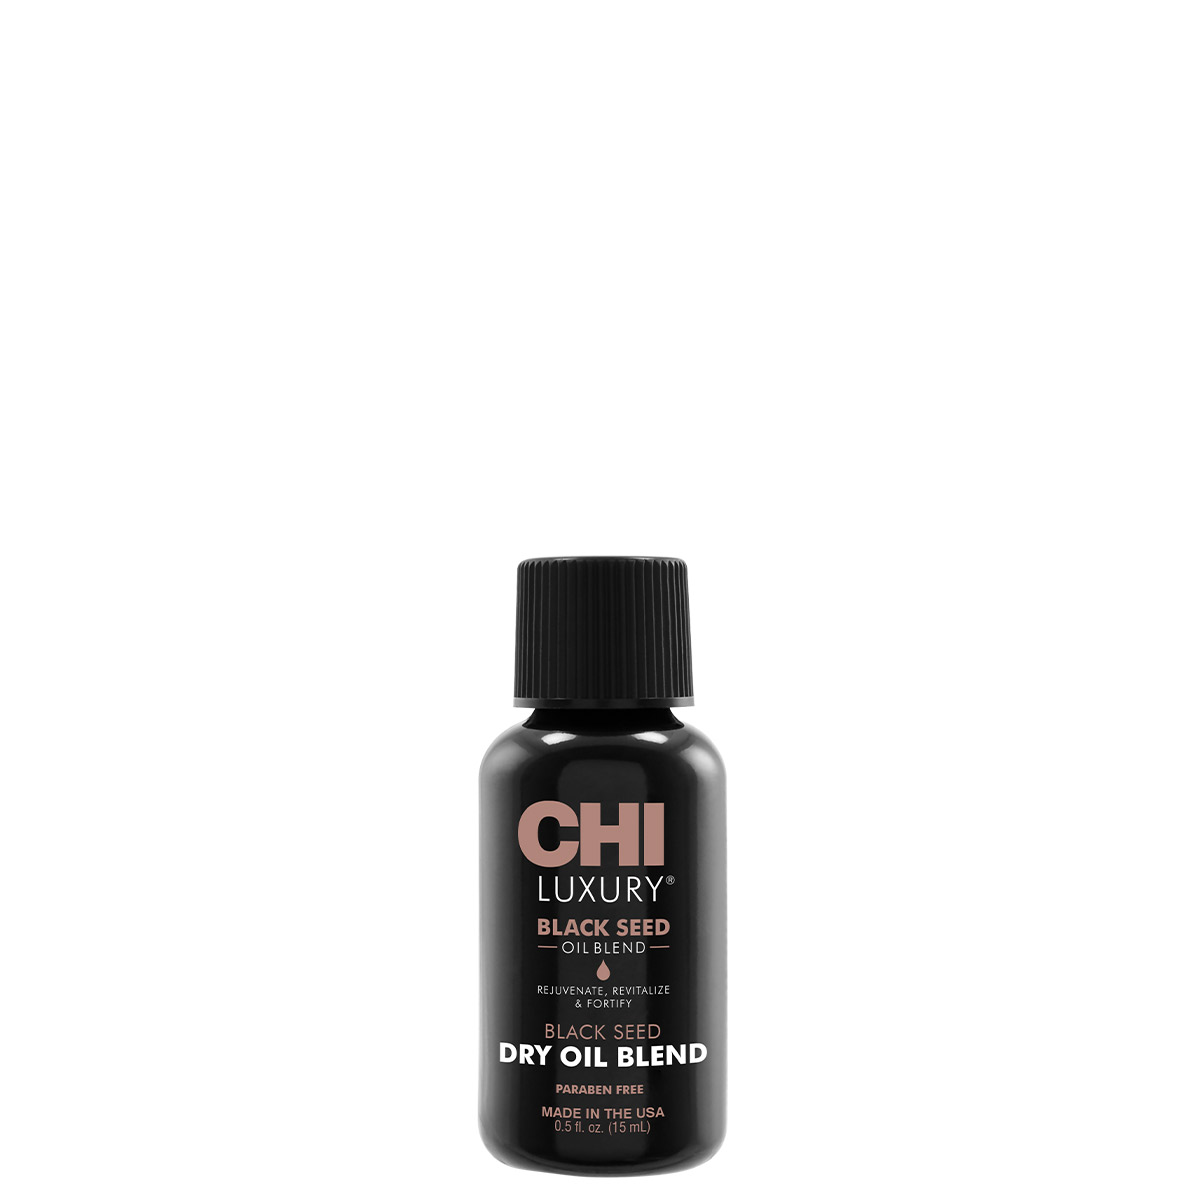 Luxury Black Seed Dry Oil